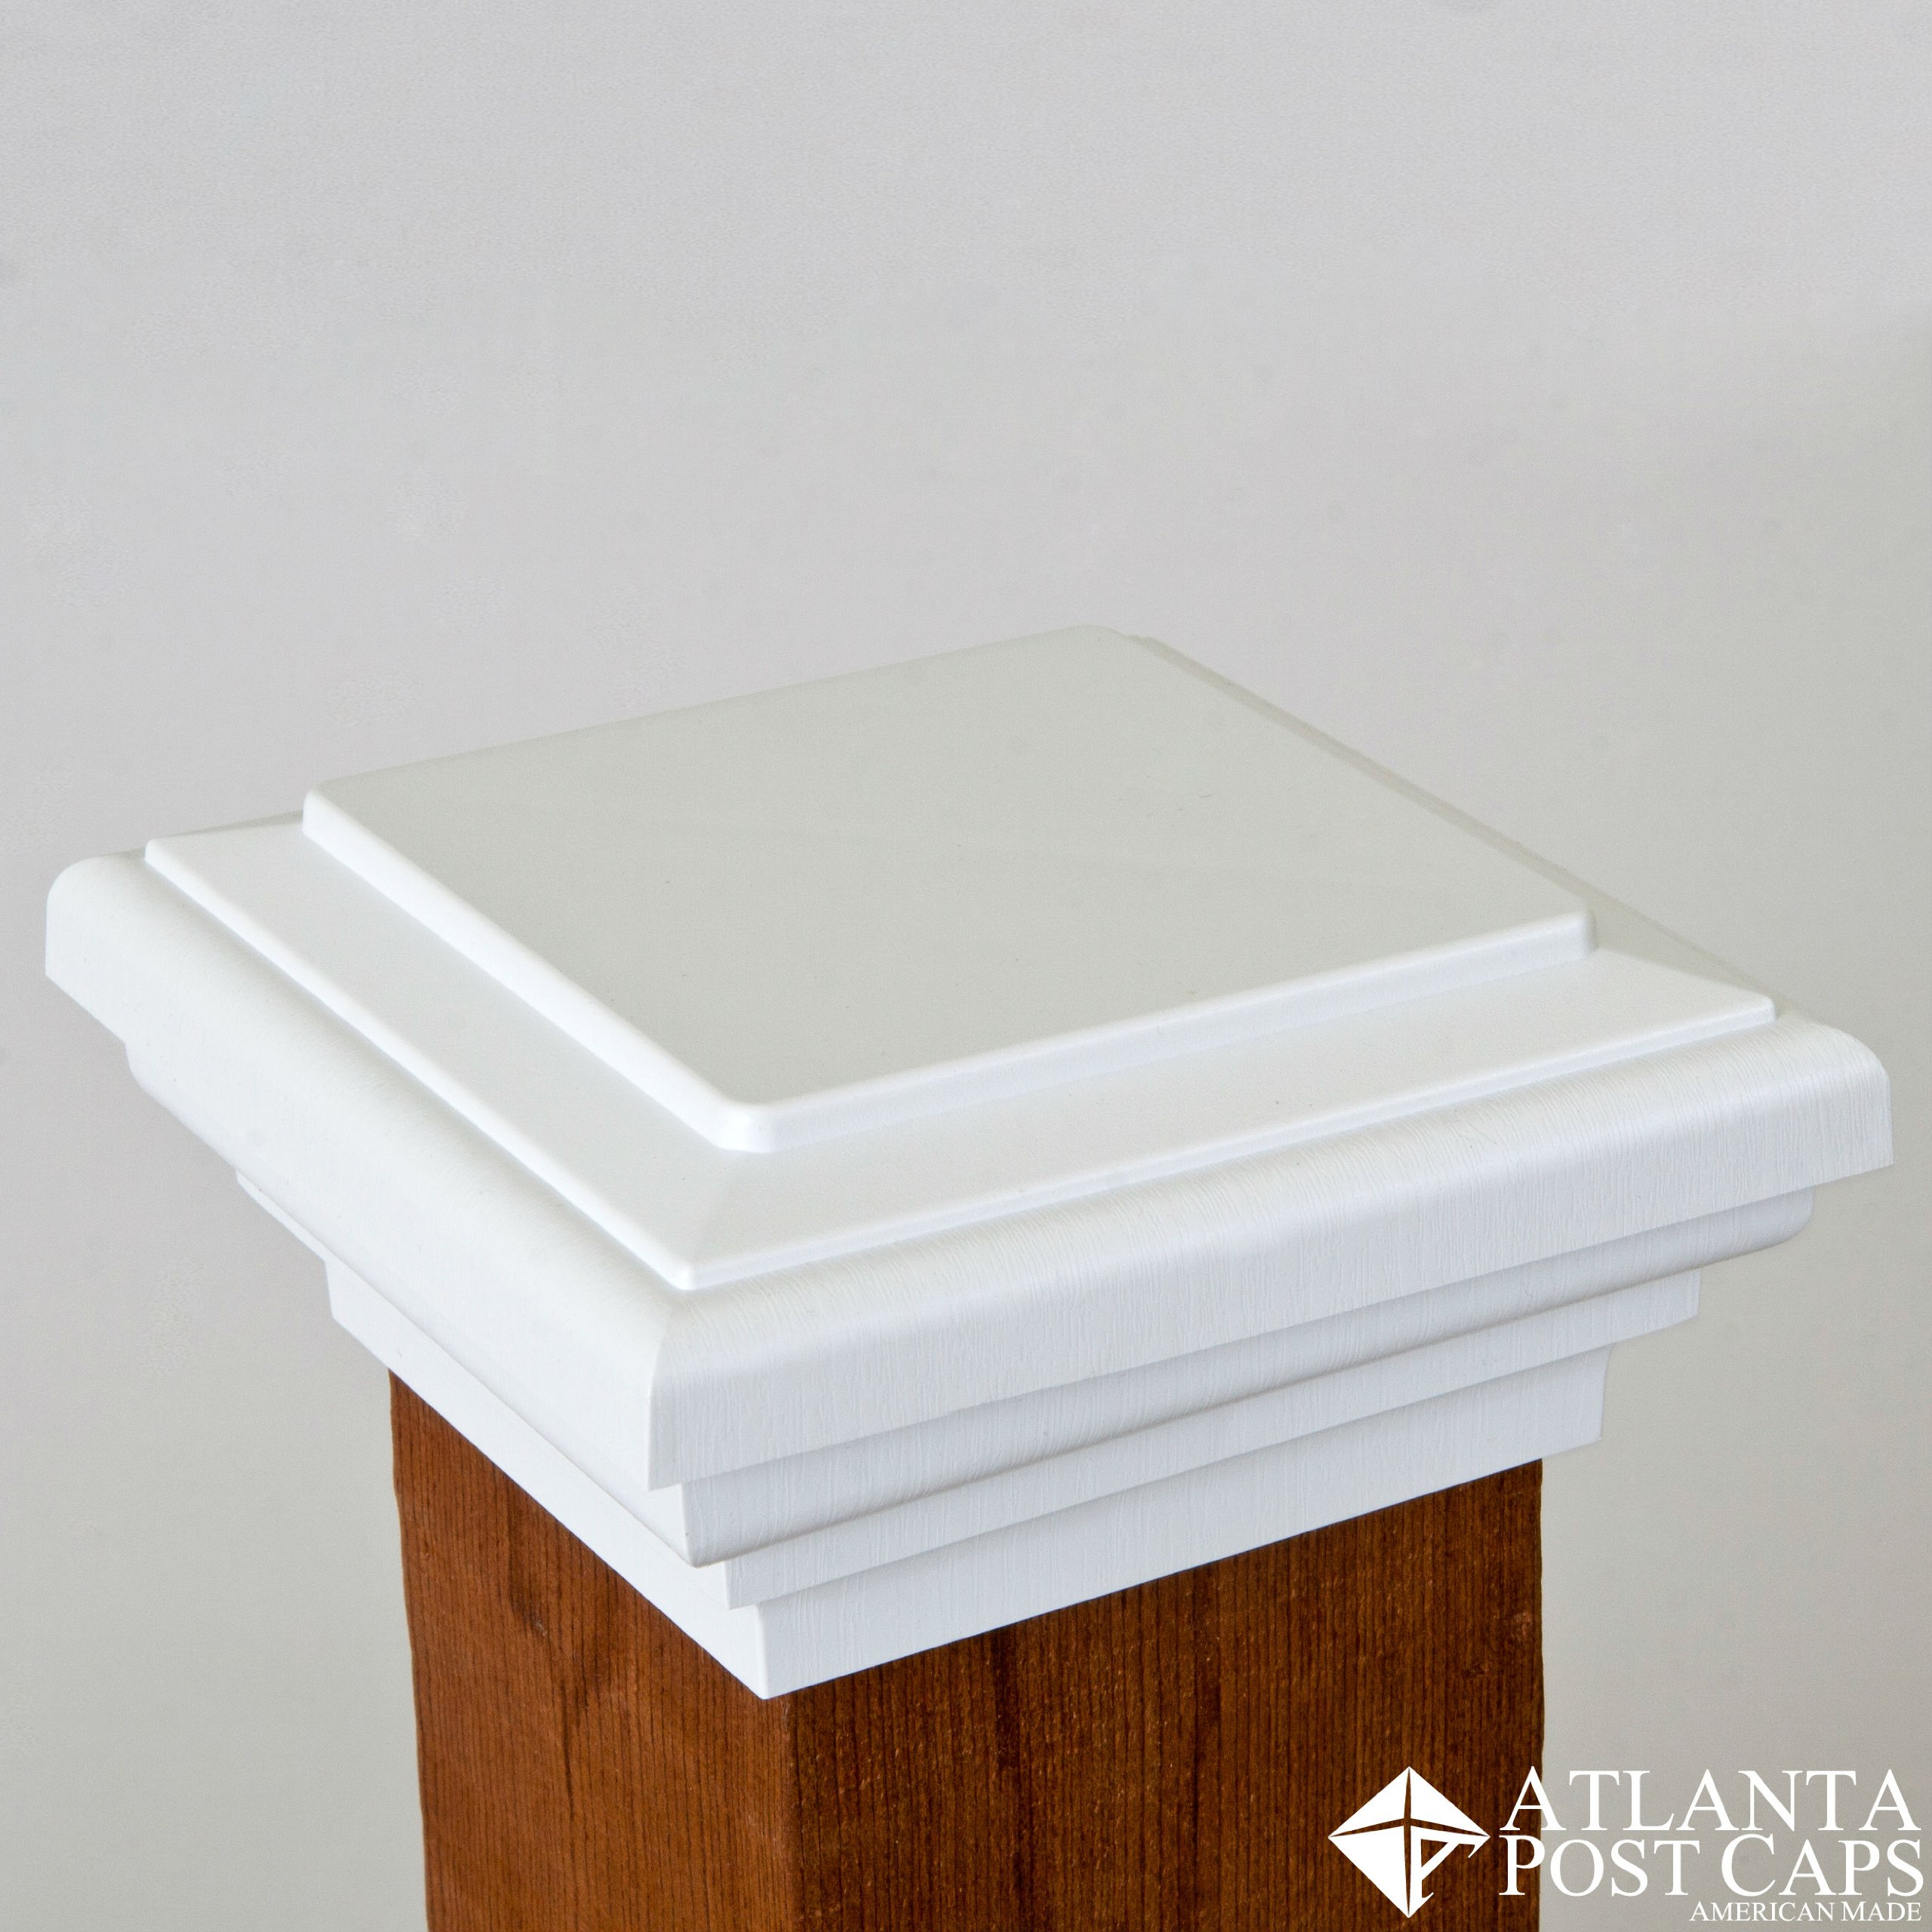 4x4 Post Cap (Nominal 3.5'') - White Flat Top - 10 Year Warranty